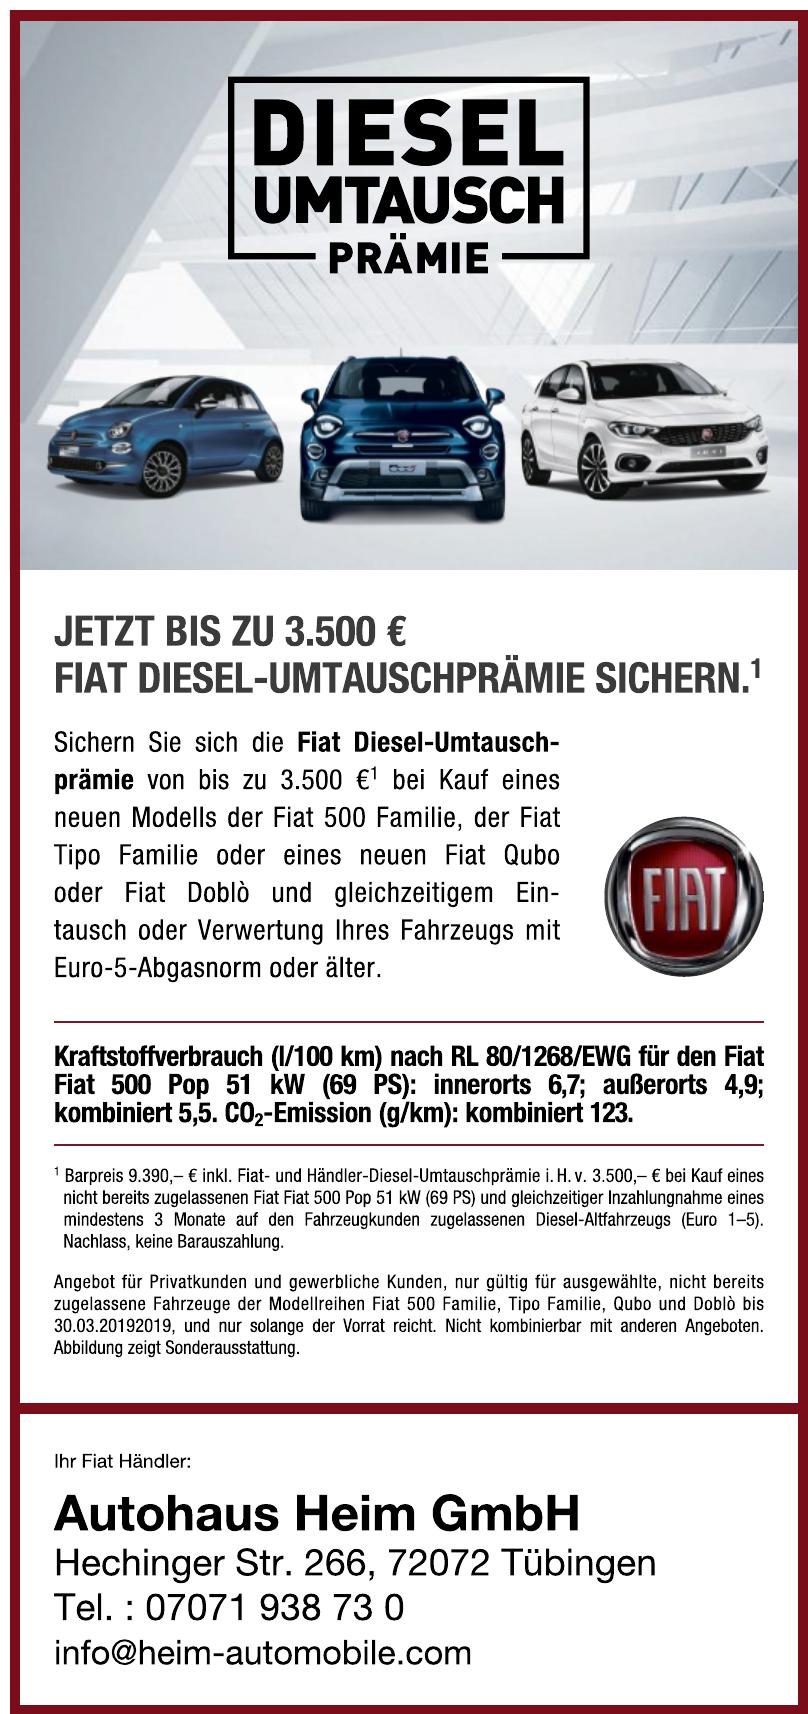 Autohaus Heim GmbH